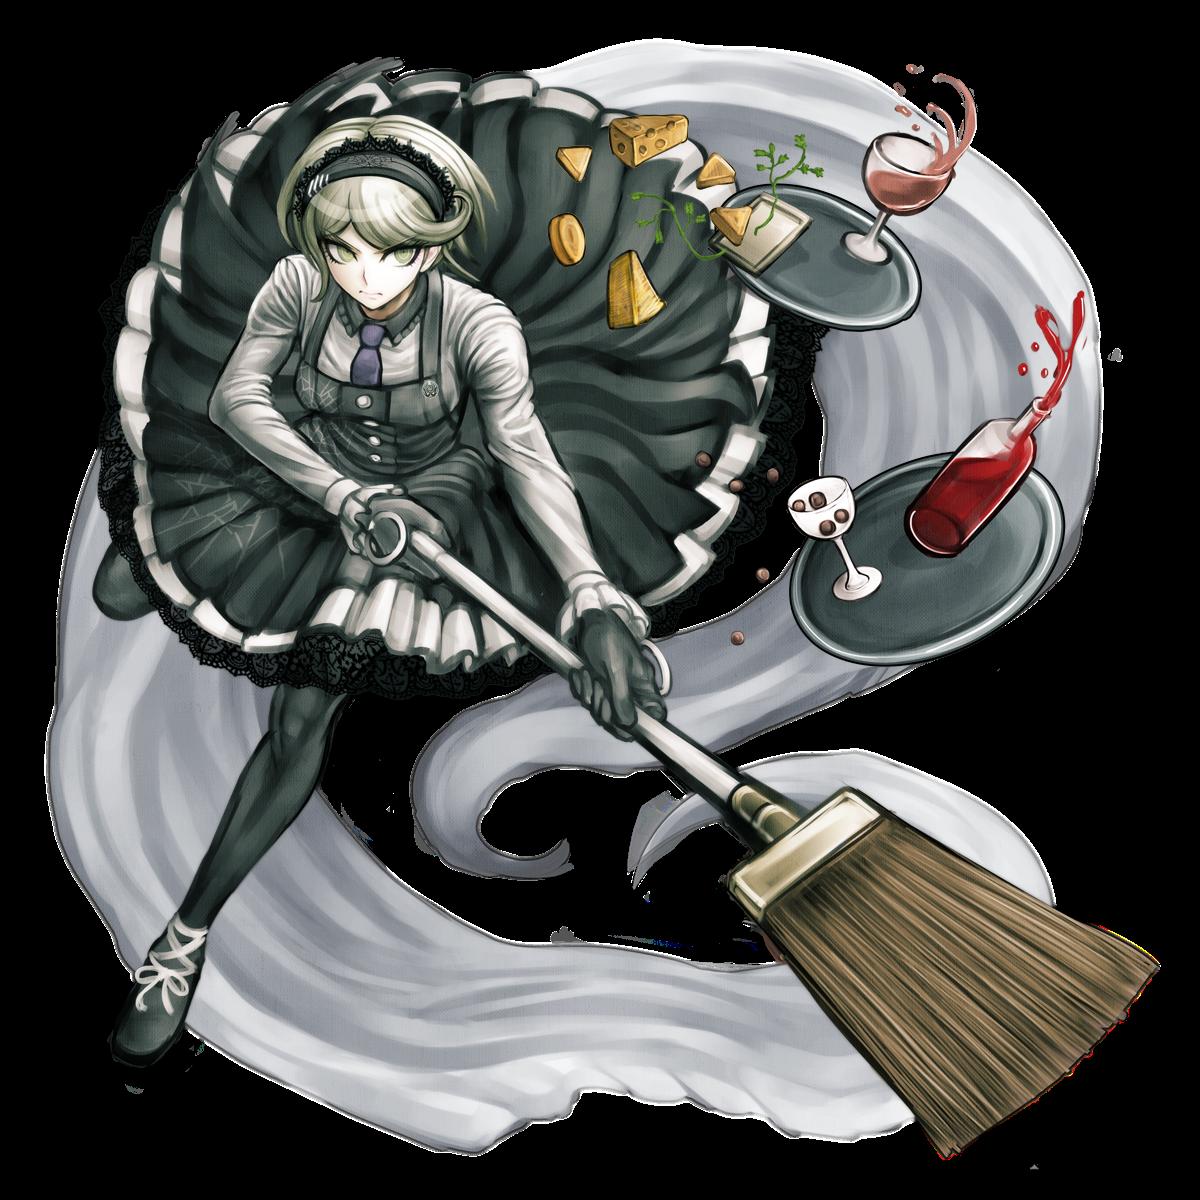 Kirumi Tojo Ultimate Maid Fate: Executed | Danganronpa